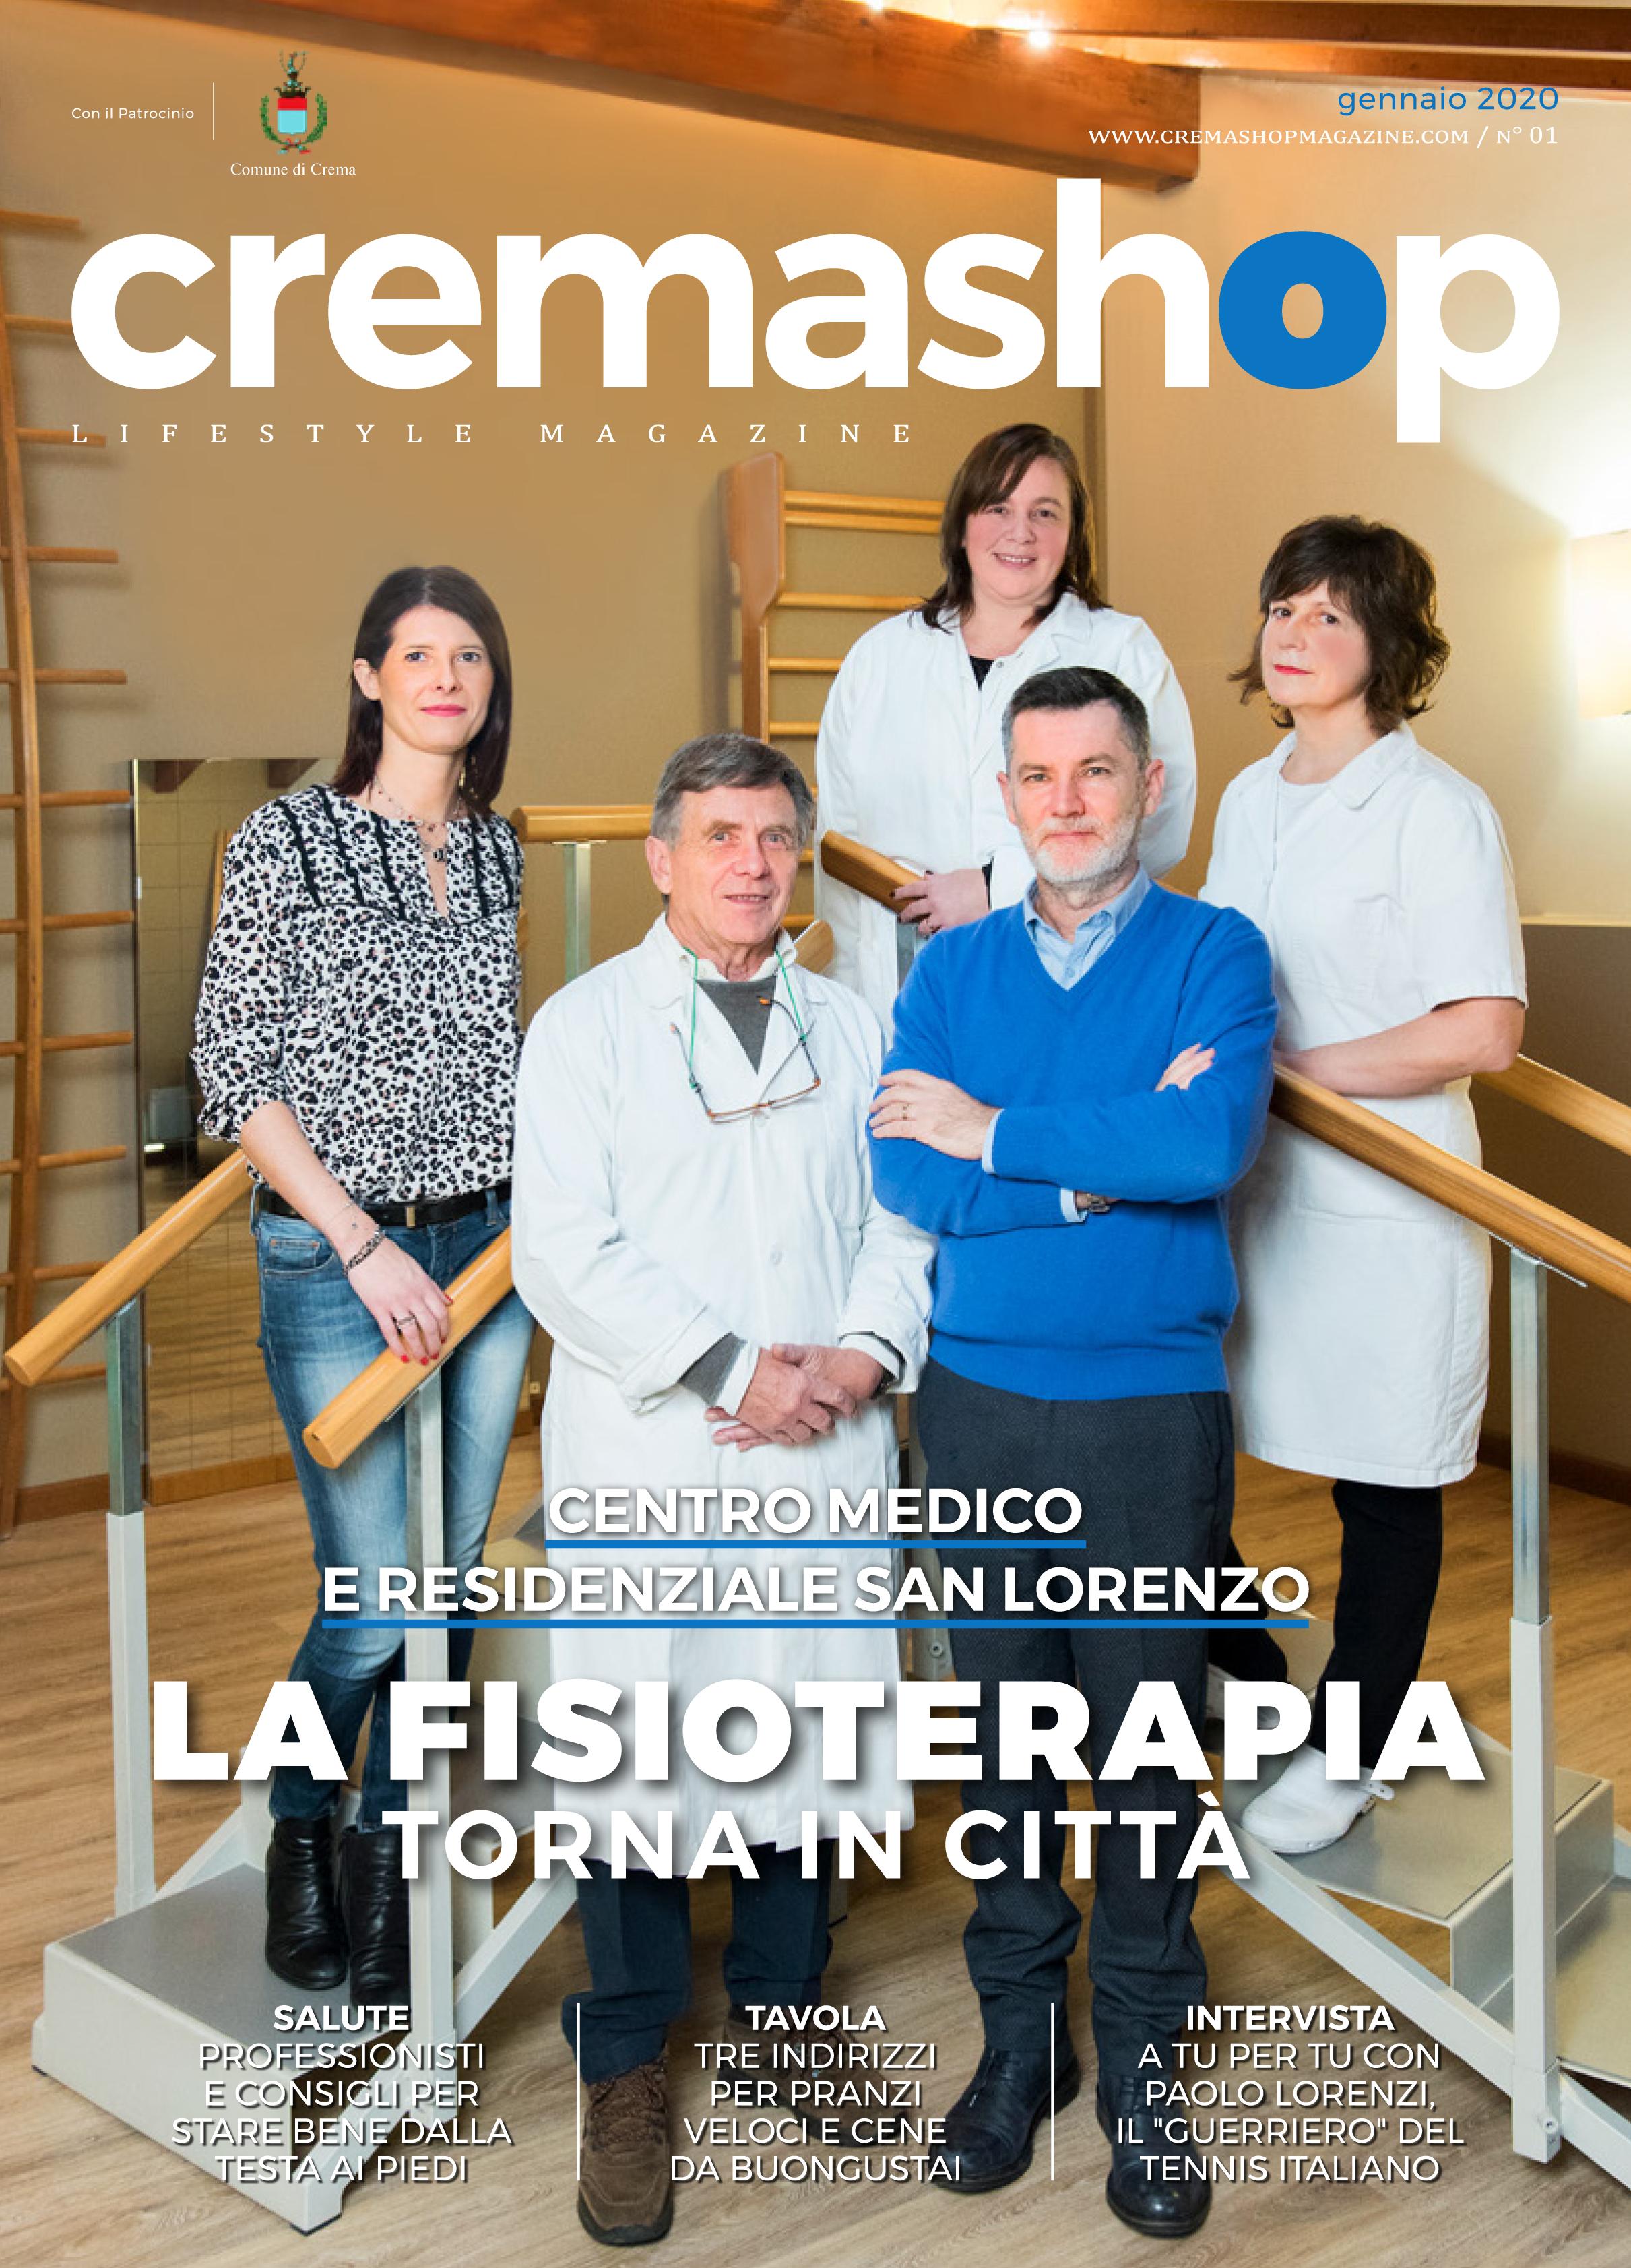 crema cremasco cremasco salute centro medico residenziale san lorenzo